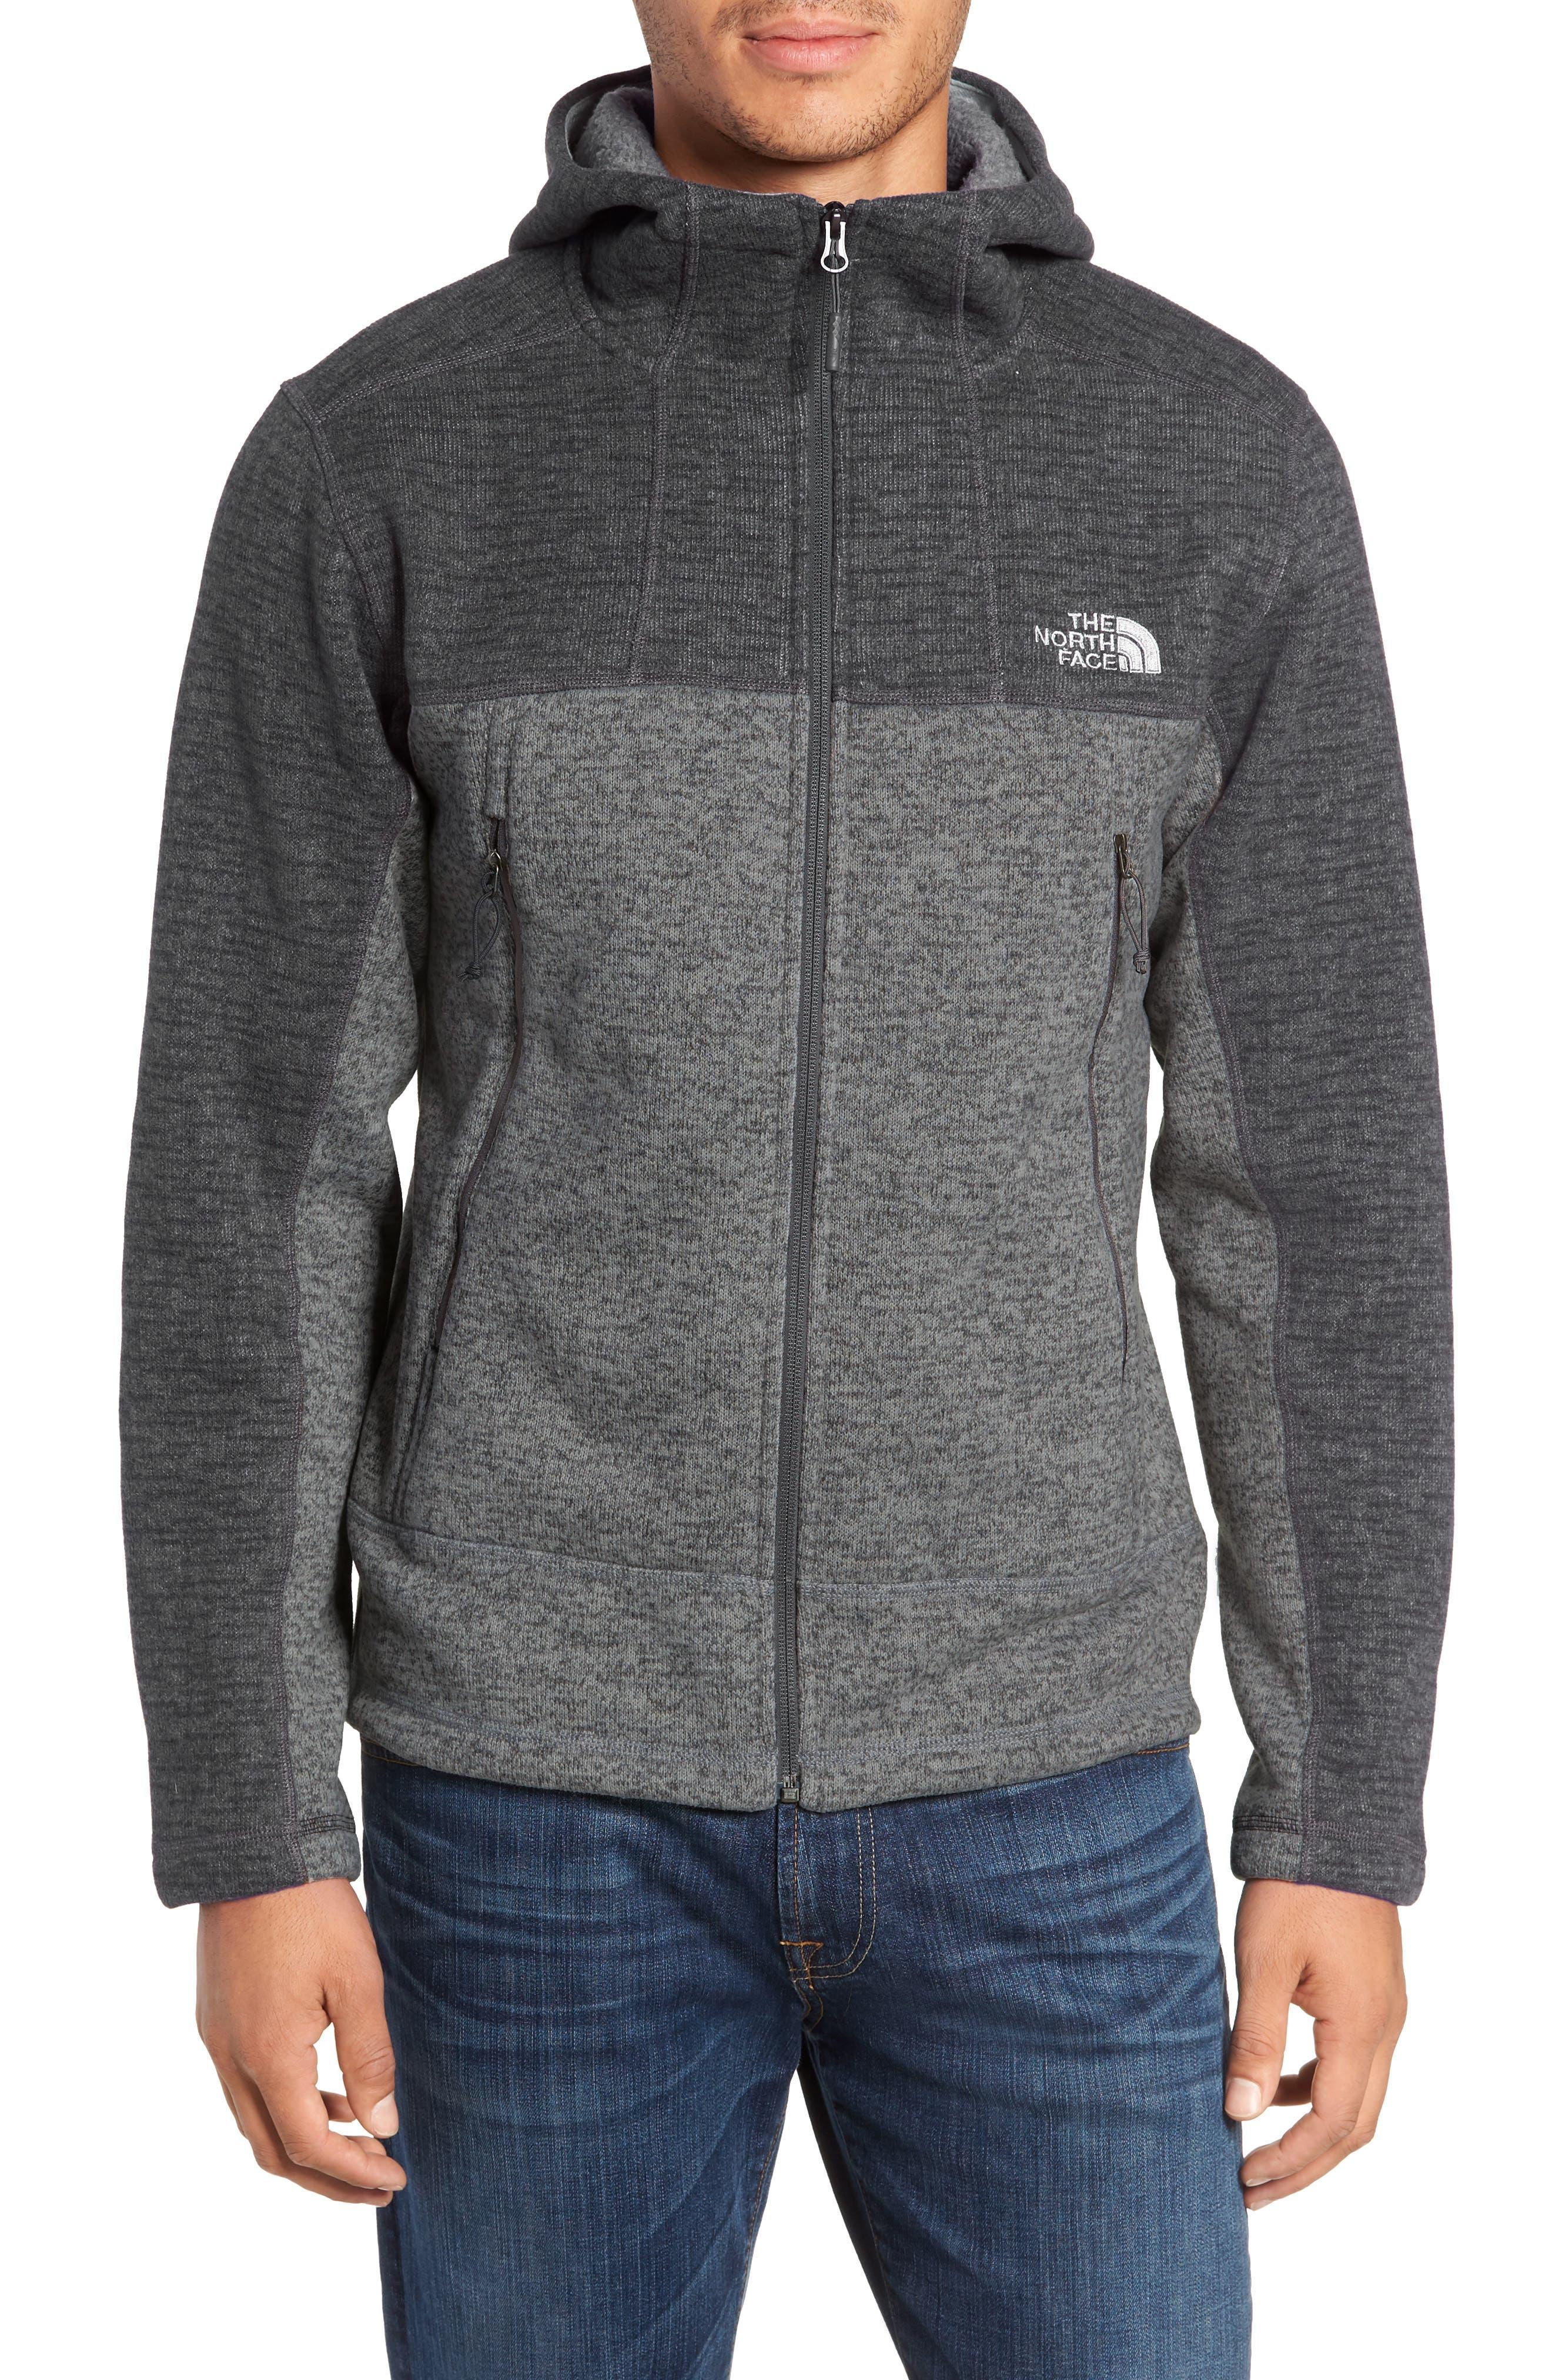 Gordon Lyons Alpine Sweater Fleece Hoodie,                         Main,                         color, ASPHALT GREY/ MONUMENT GREY